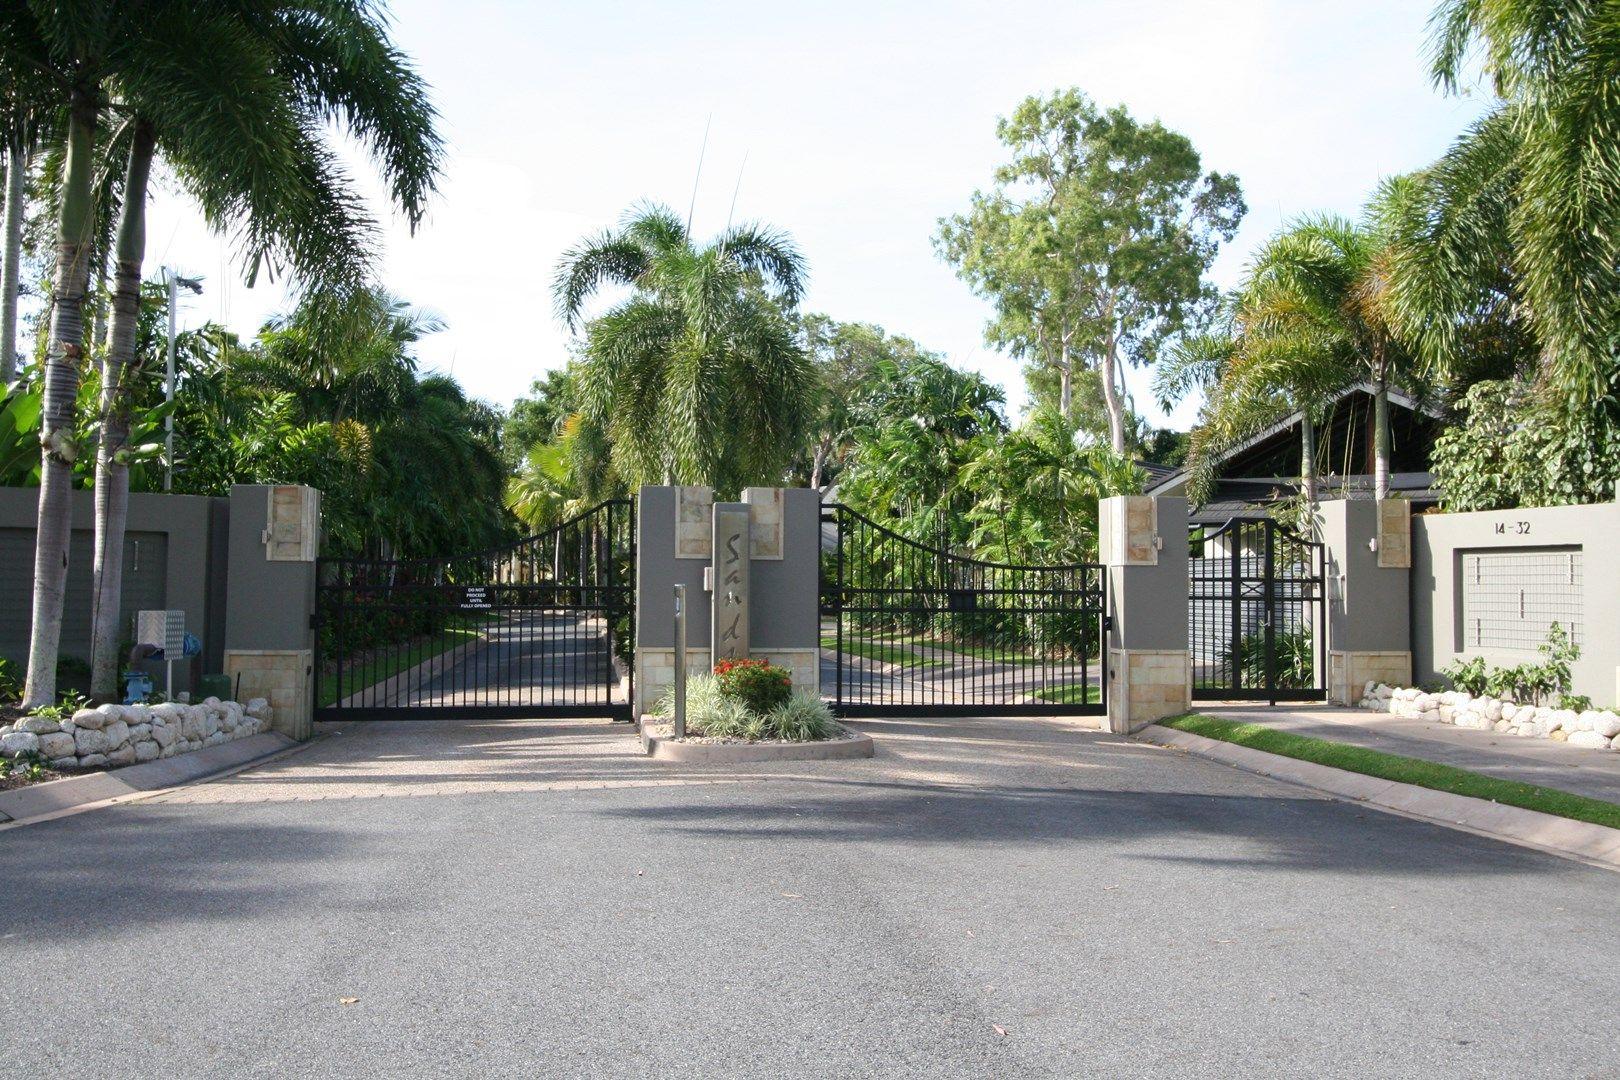 1/14-32 Barrier Street The Sands, Port Douglas QLD 4877, Image 0